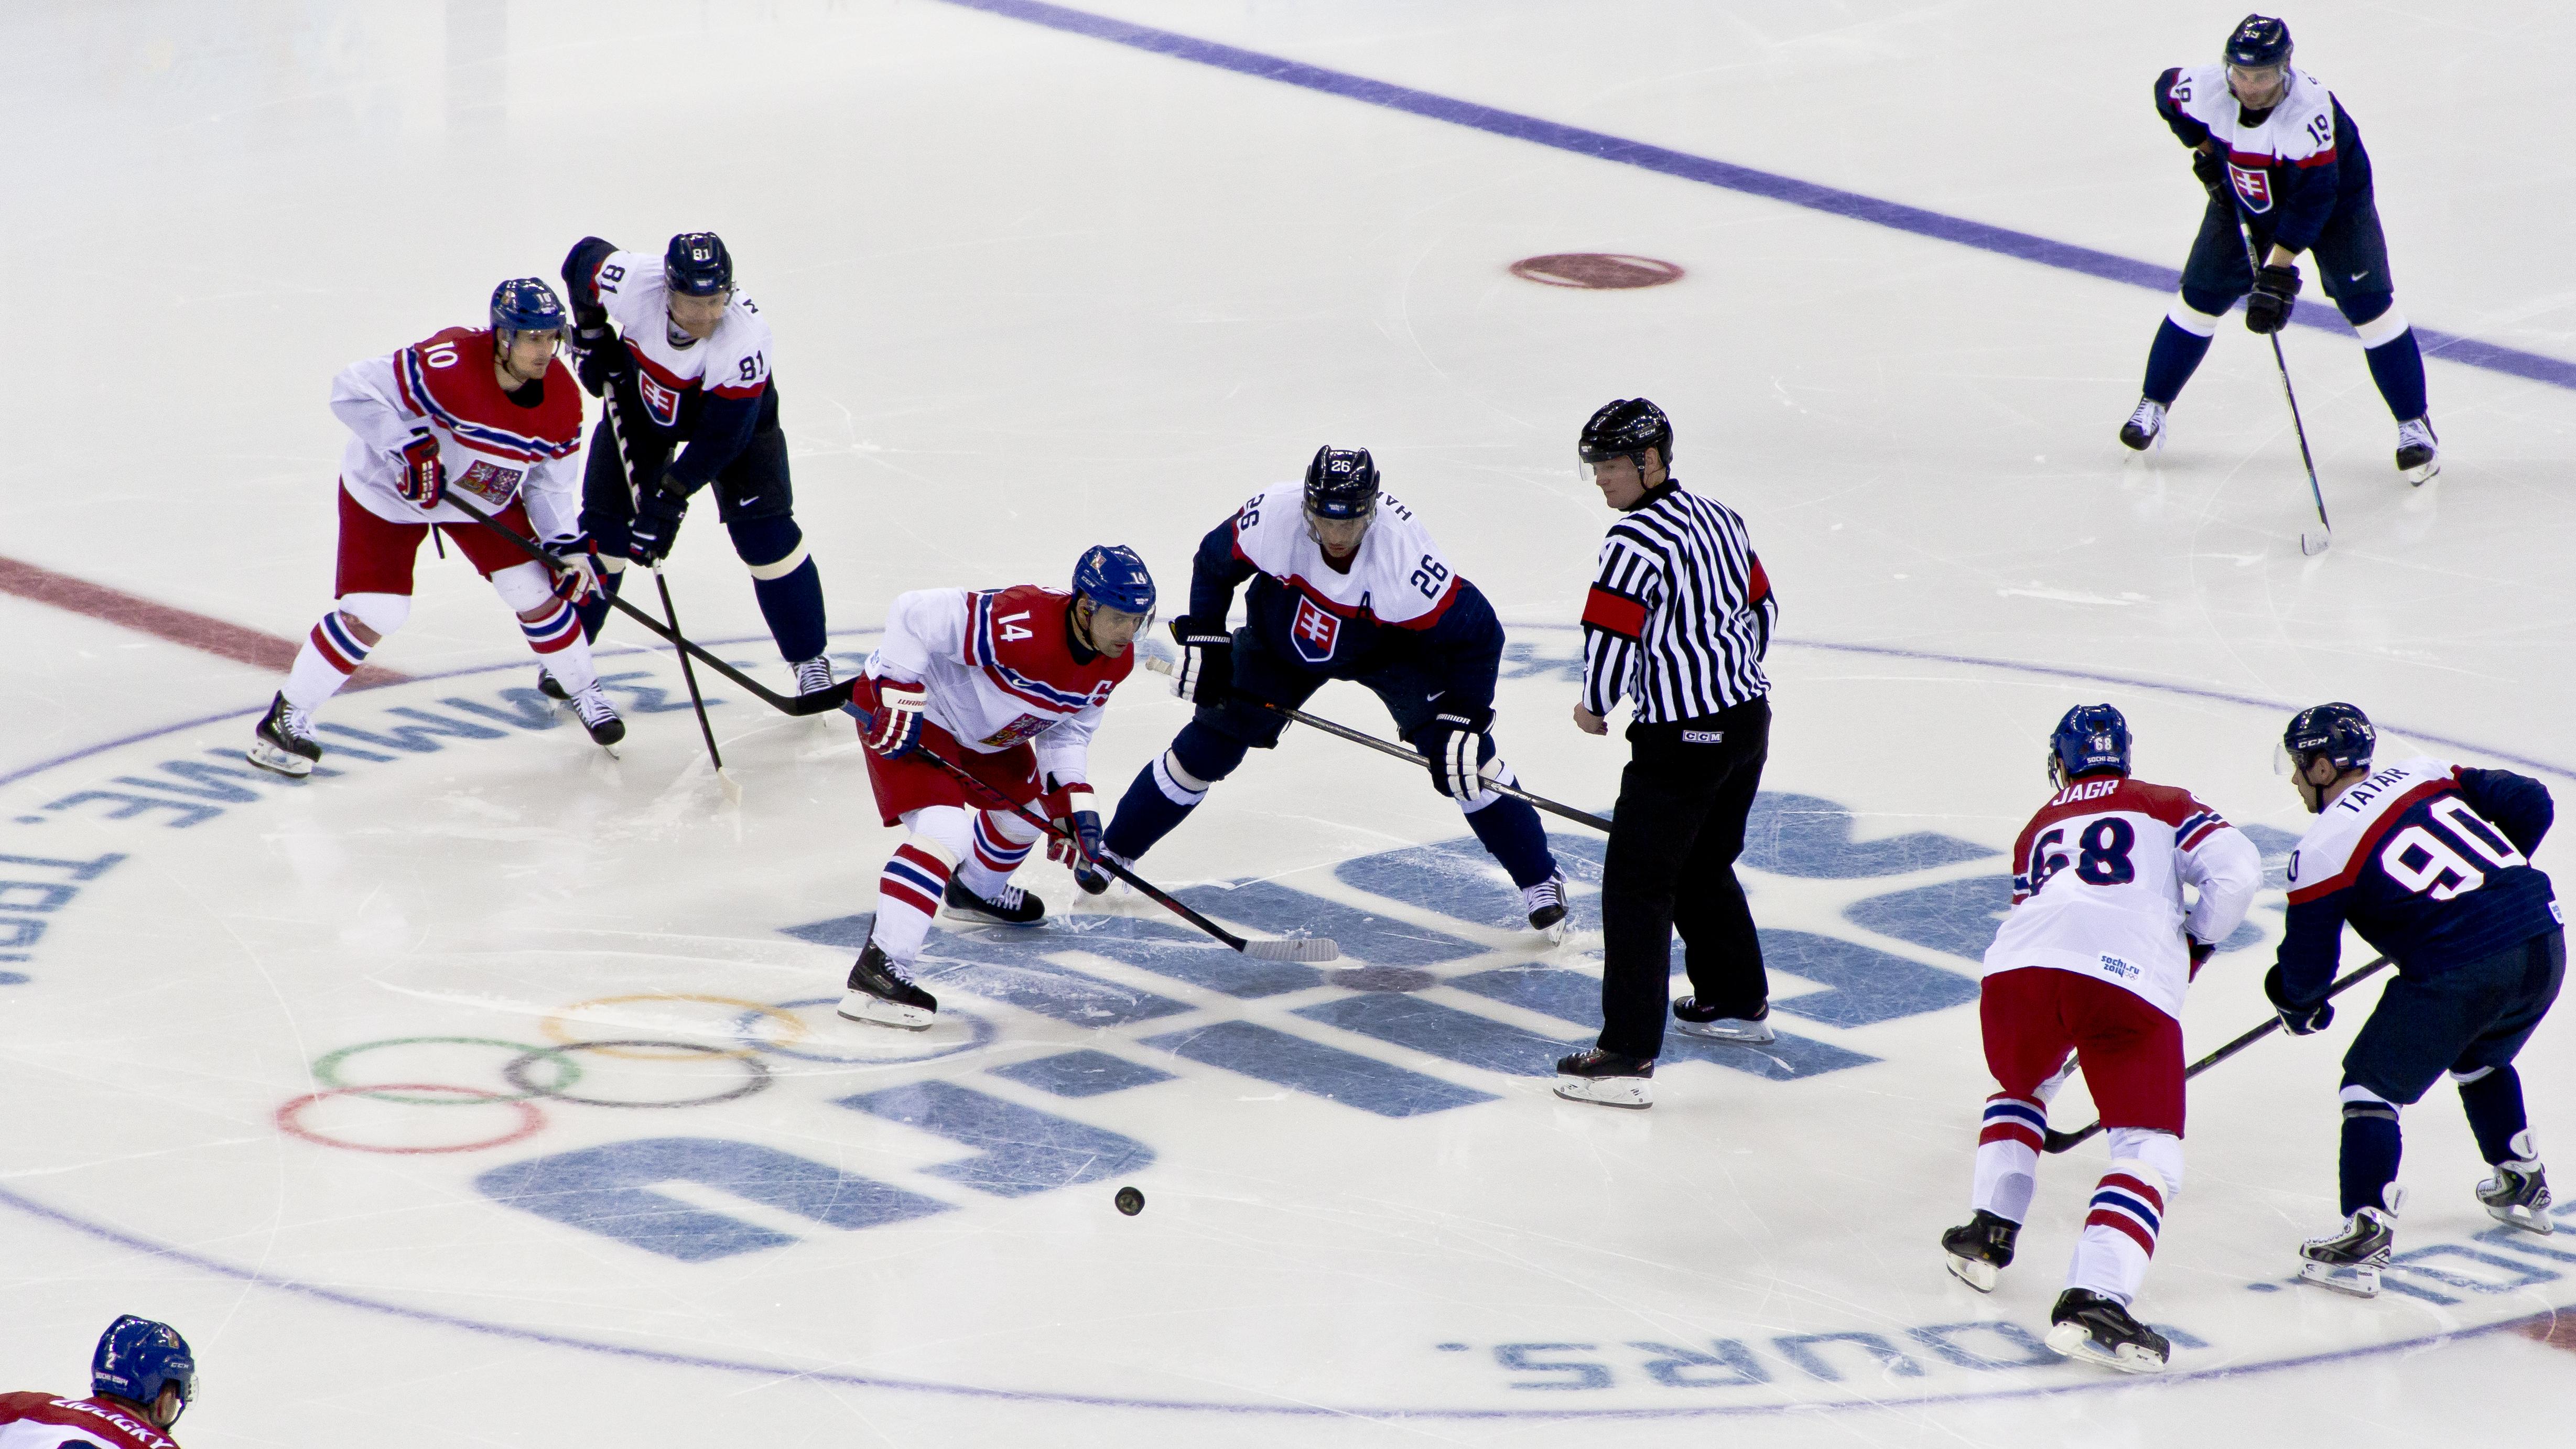 4914x2764 > Ice Hockey Wallpapers